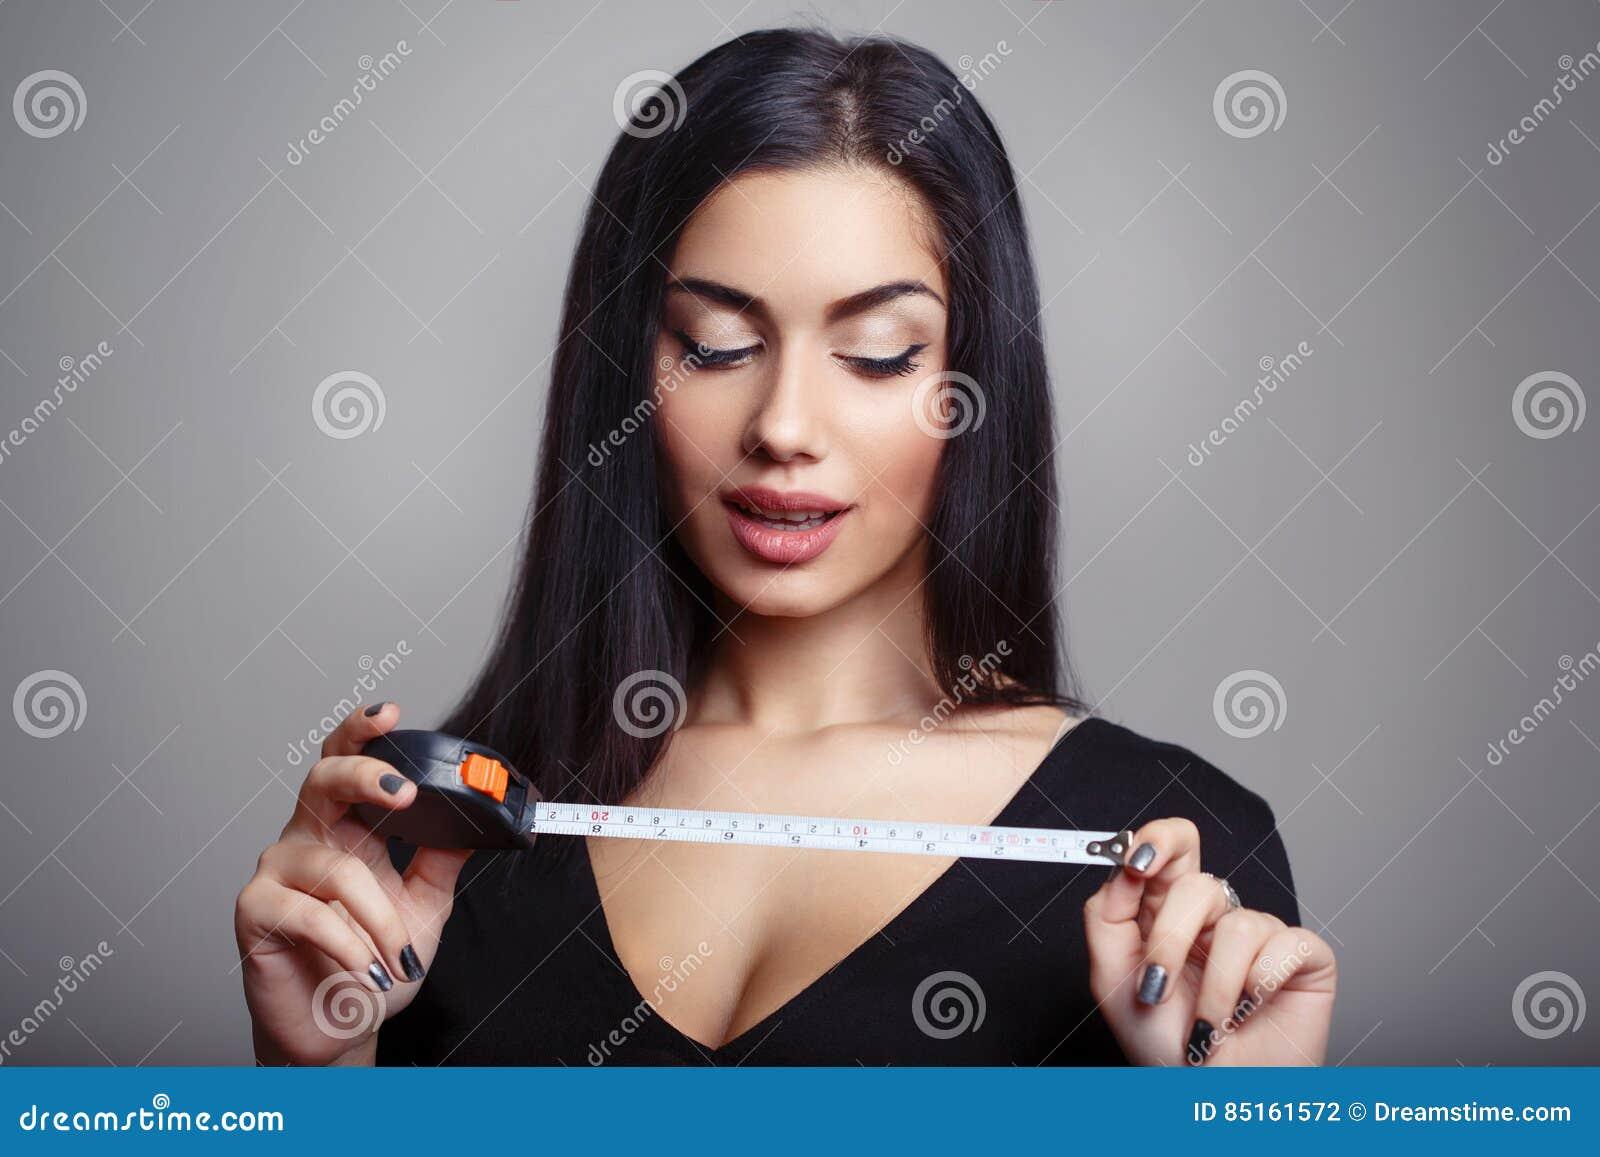 donne prendono grande pene